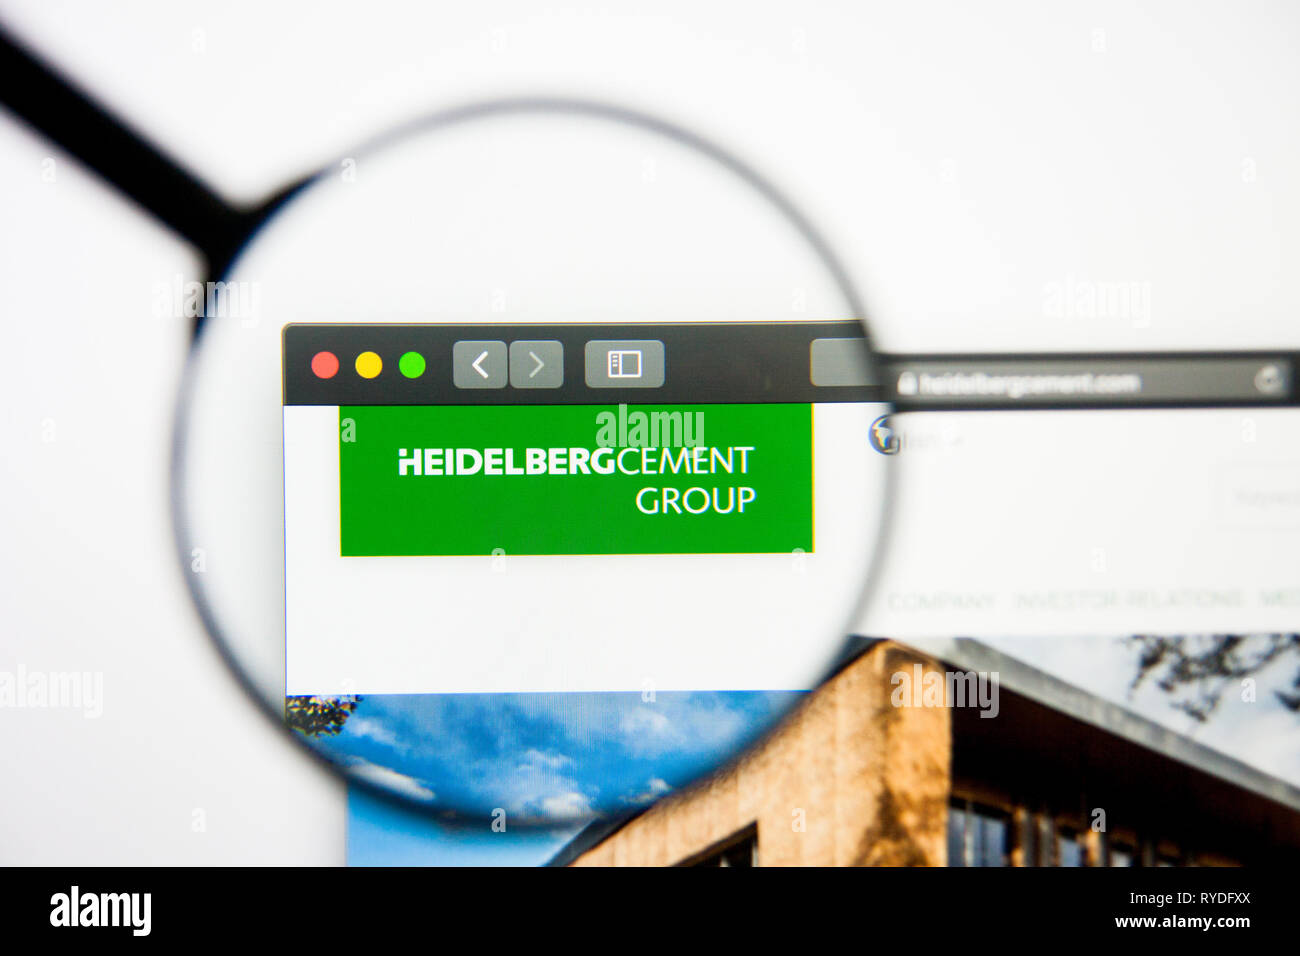 Los Angeles, California, USA - 5 March 2019: HeidelbergCement website homepage. HeidelbergCement logo visible on display screen, Illustrative - Stock Image